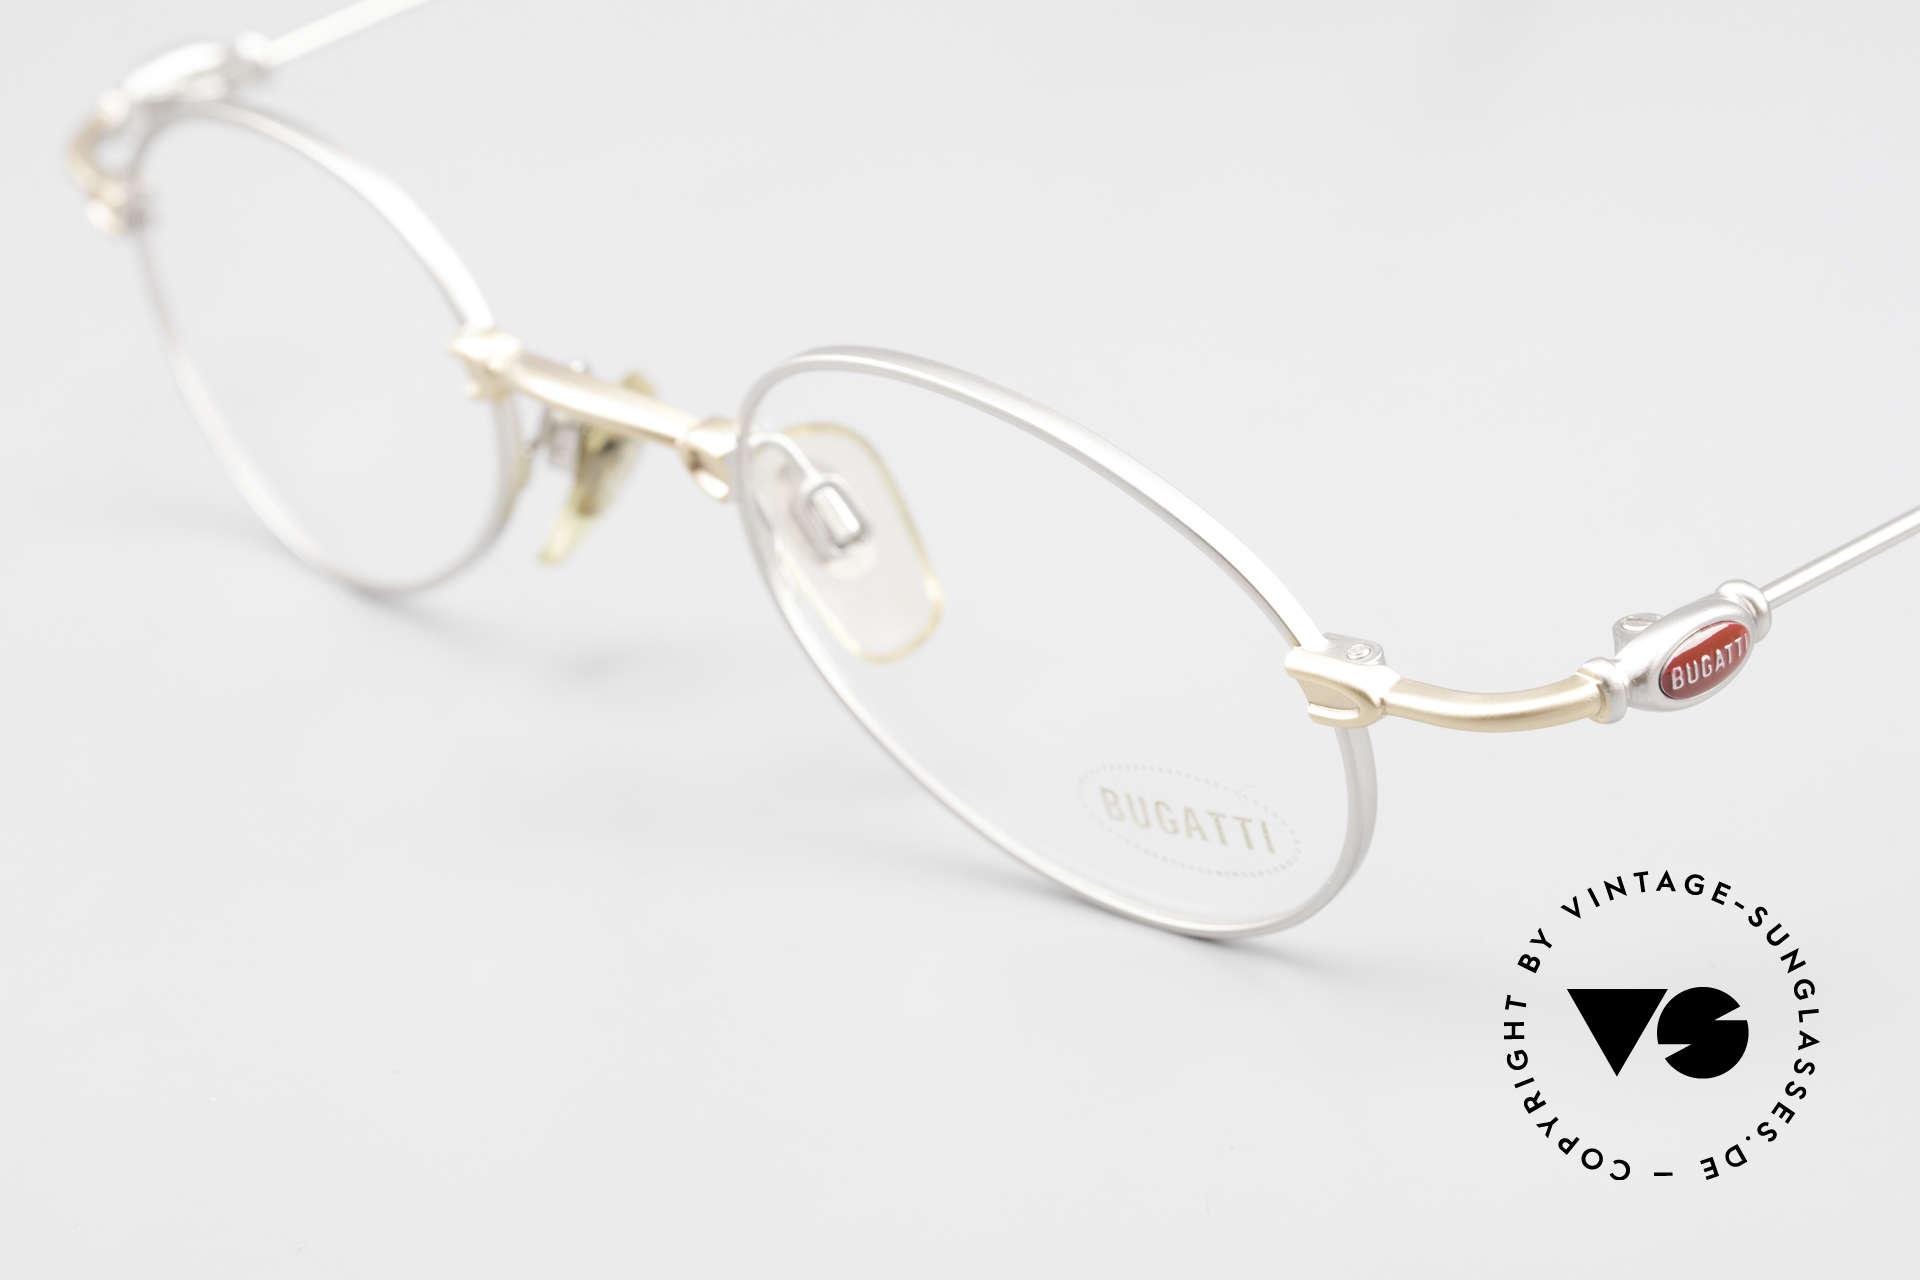 Bugatti 10759 Vintage Eyeglasses Men 90's, unworn rarity of the late 90's (incl. Bugatti hard case), Made for Men